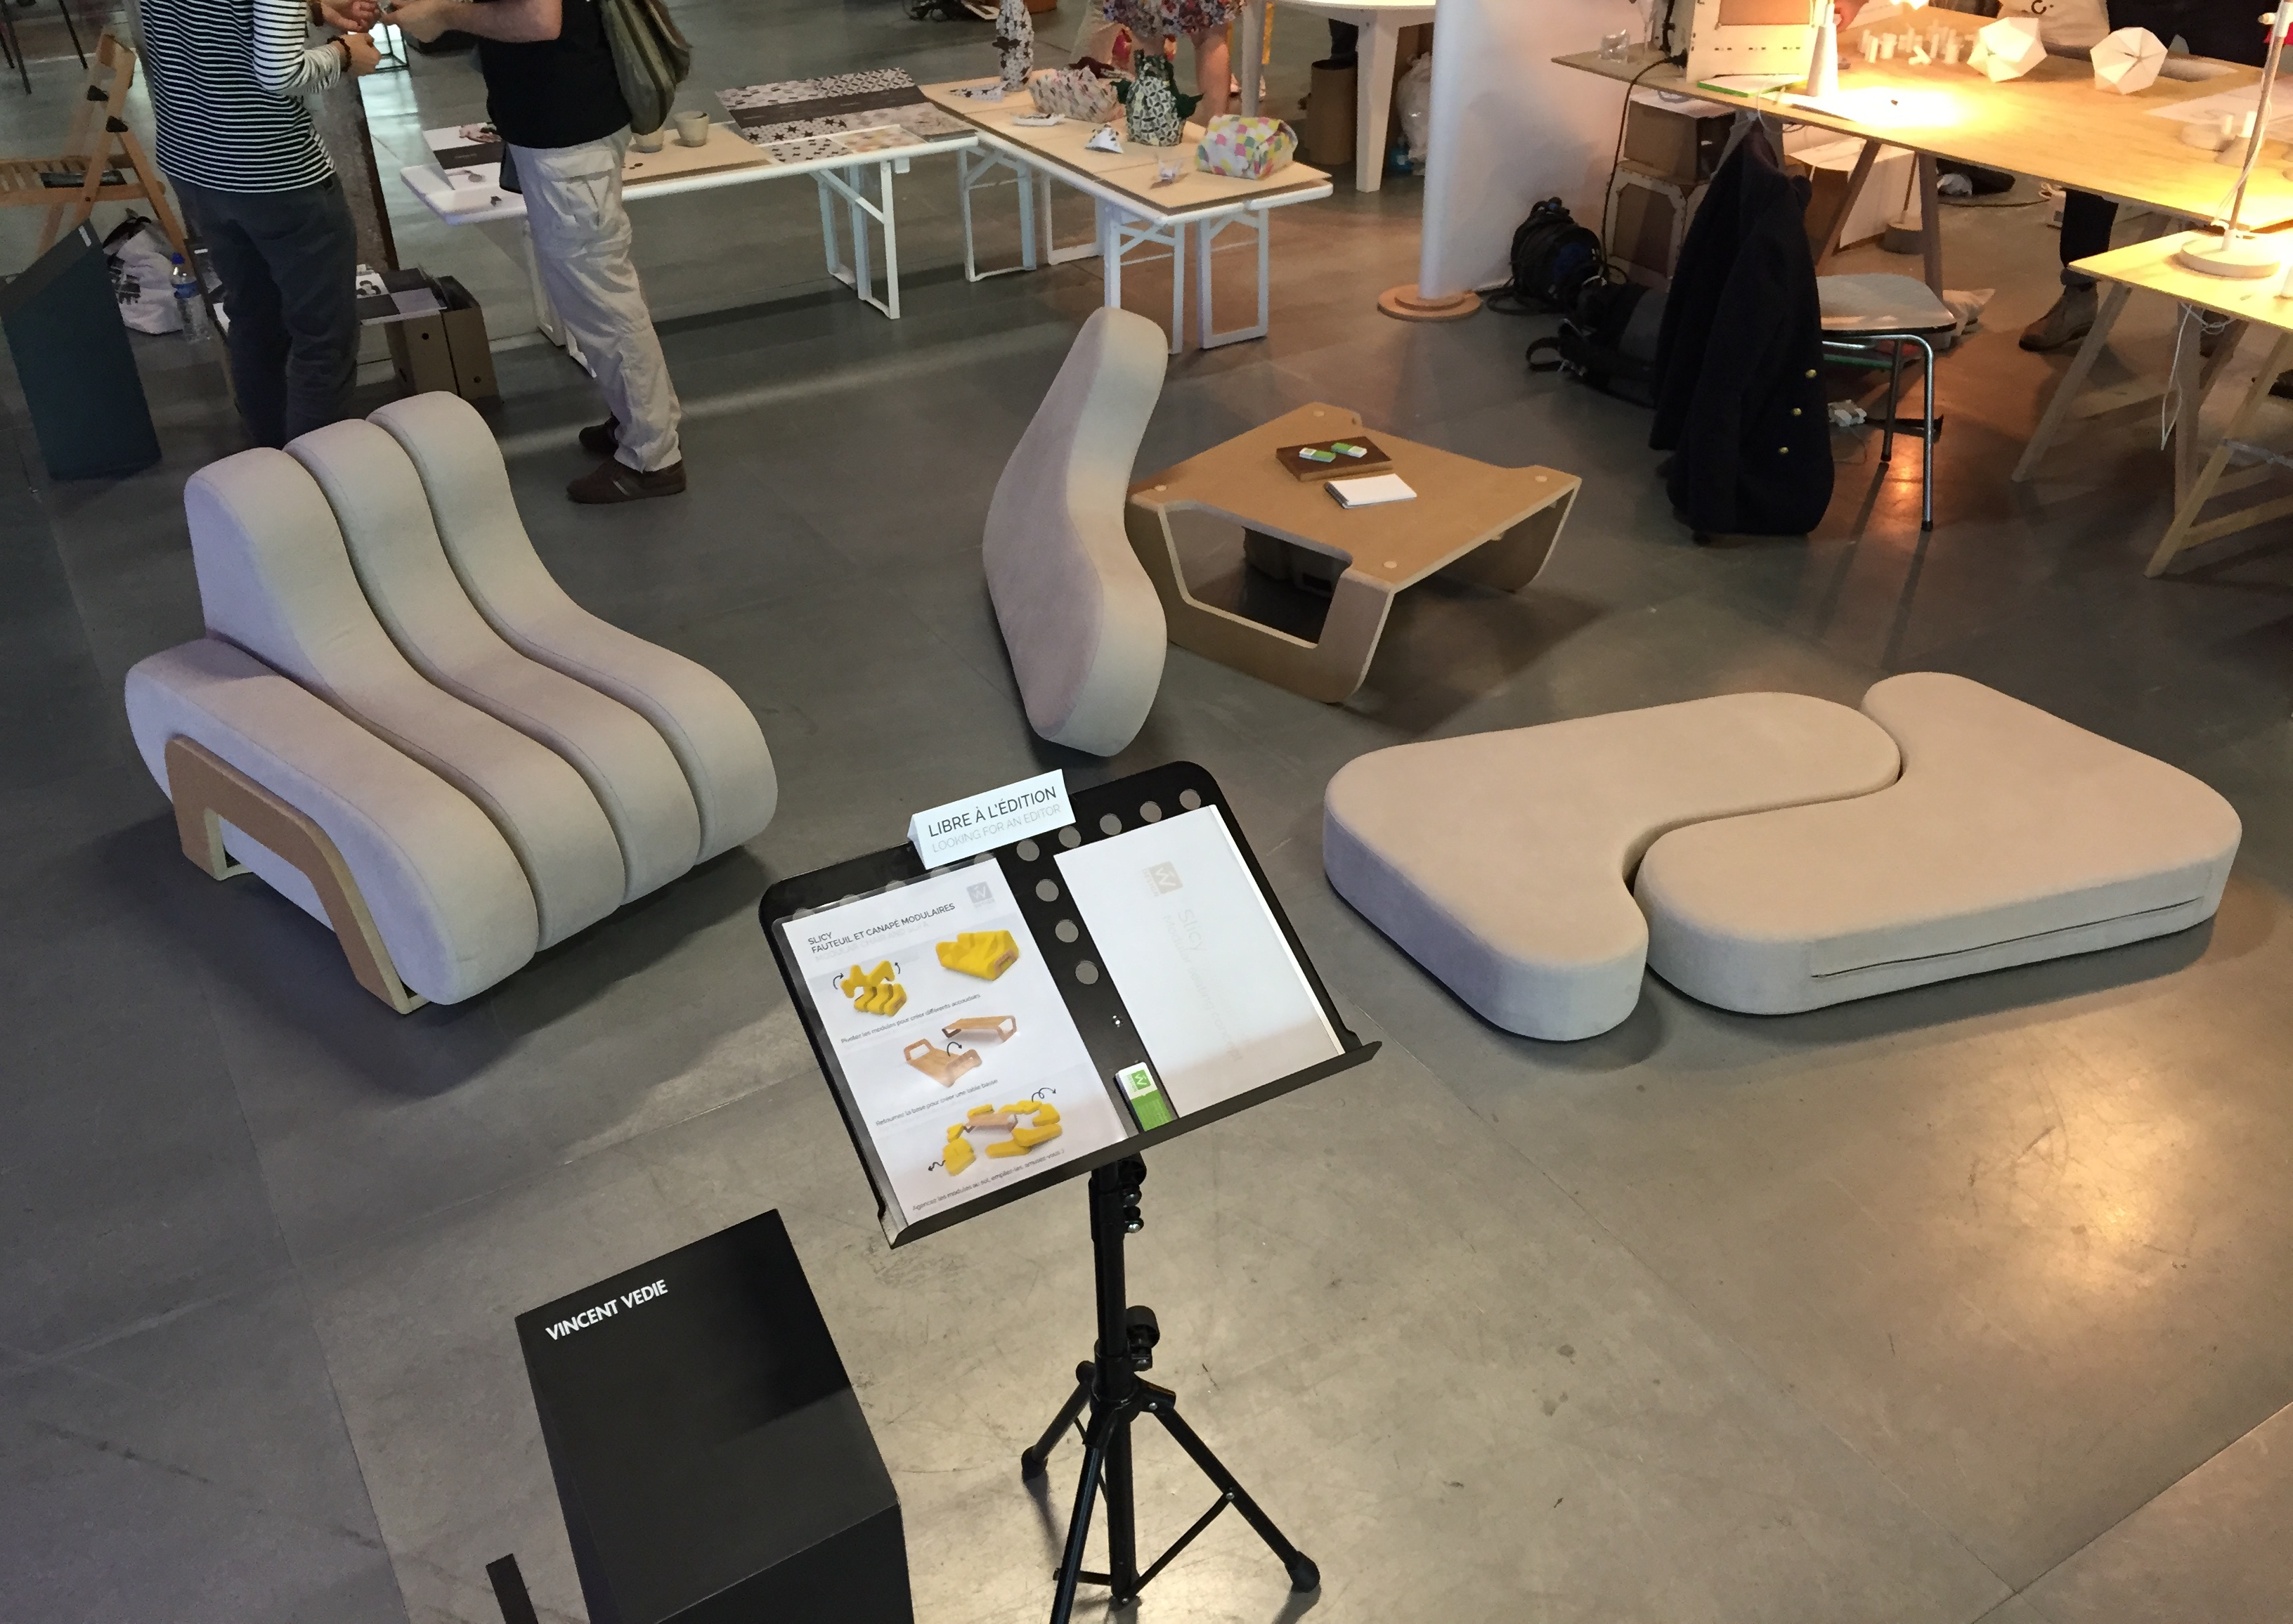 Vincent Vedie Product designer Modular furniture design Maison et objets Paris Prototype.JPG